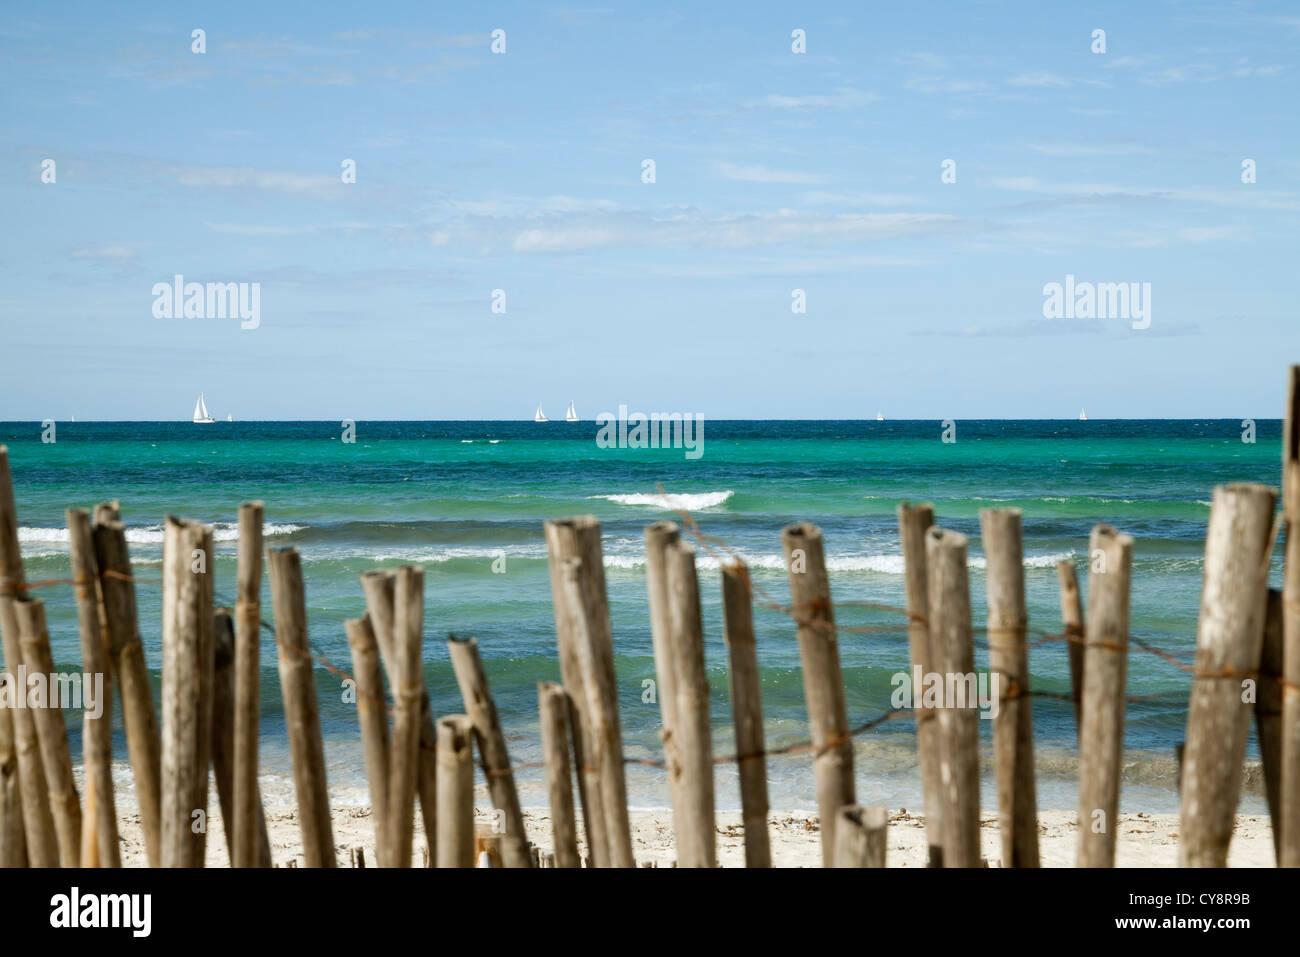 Tranquil beach scene - Stock Image